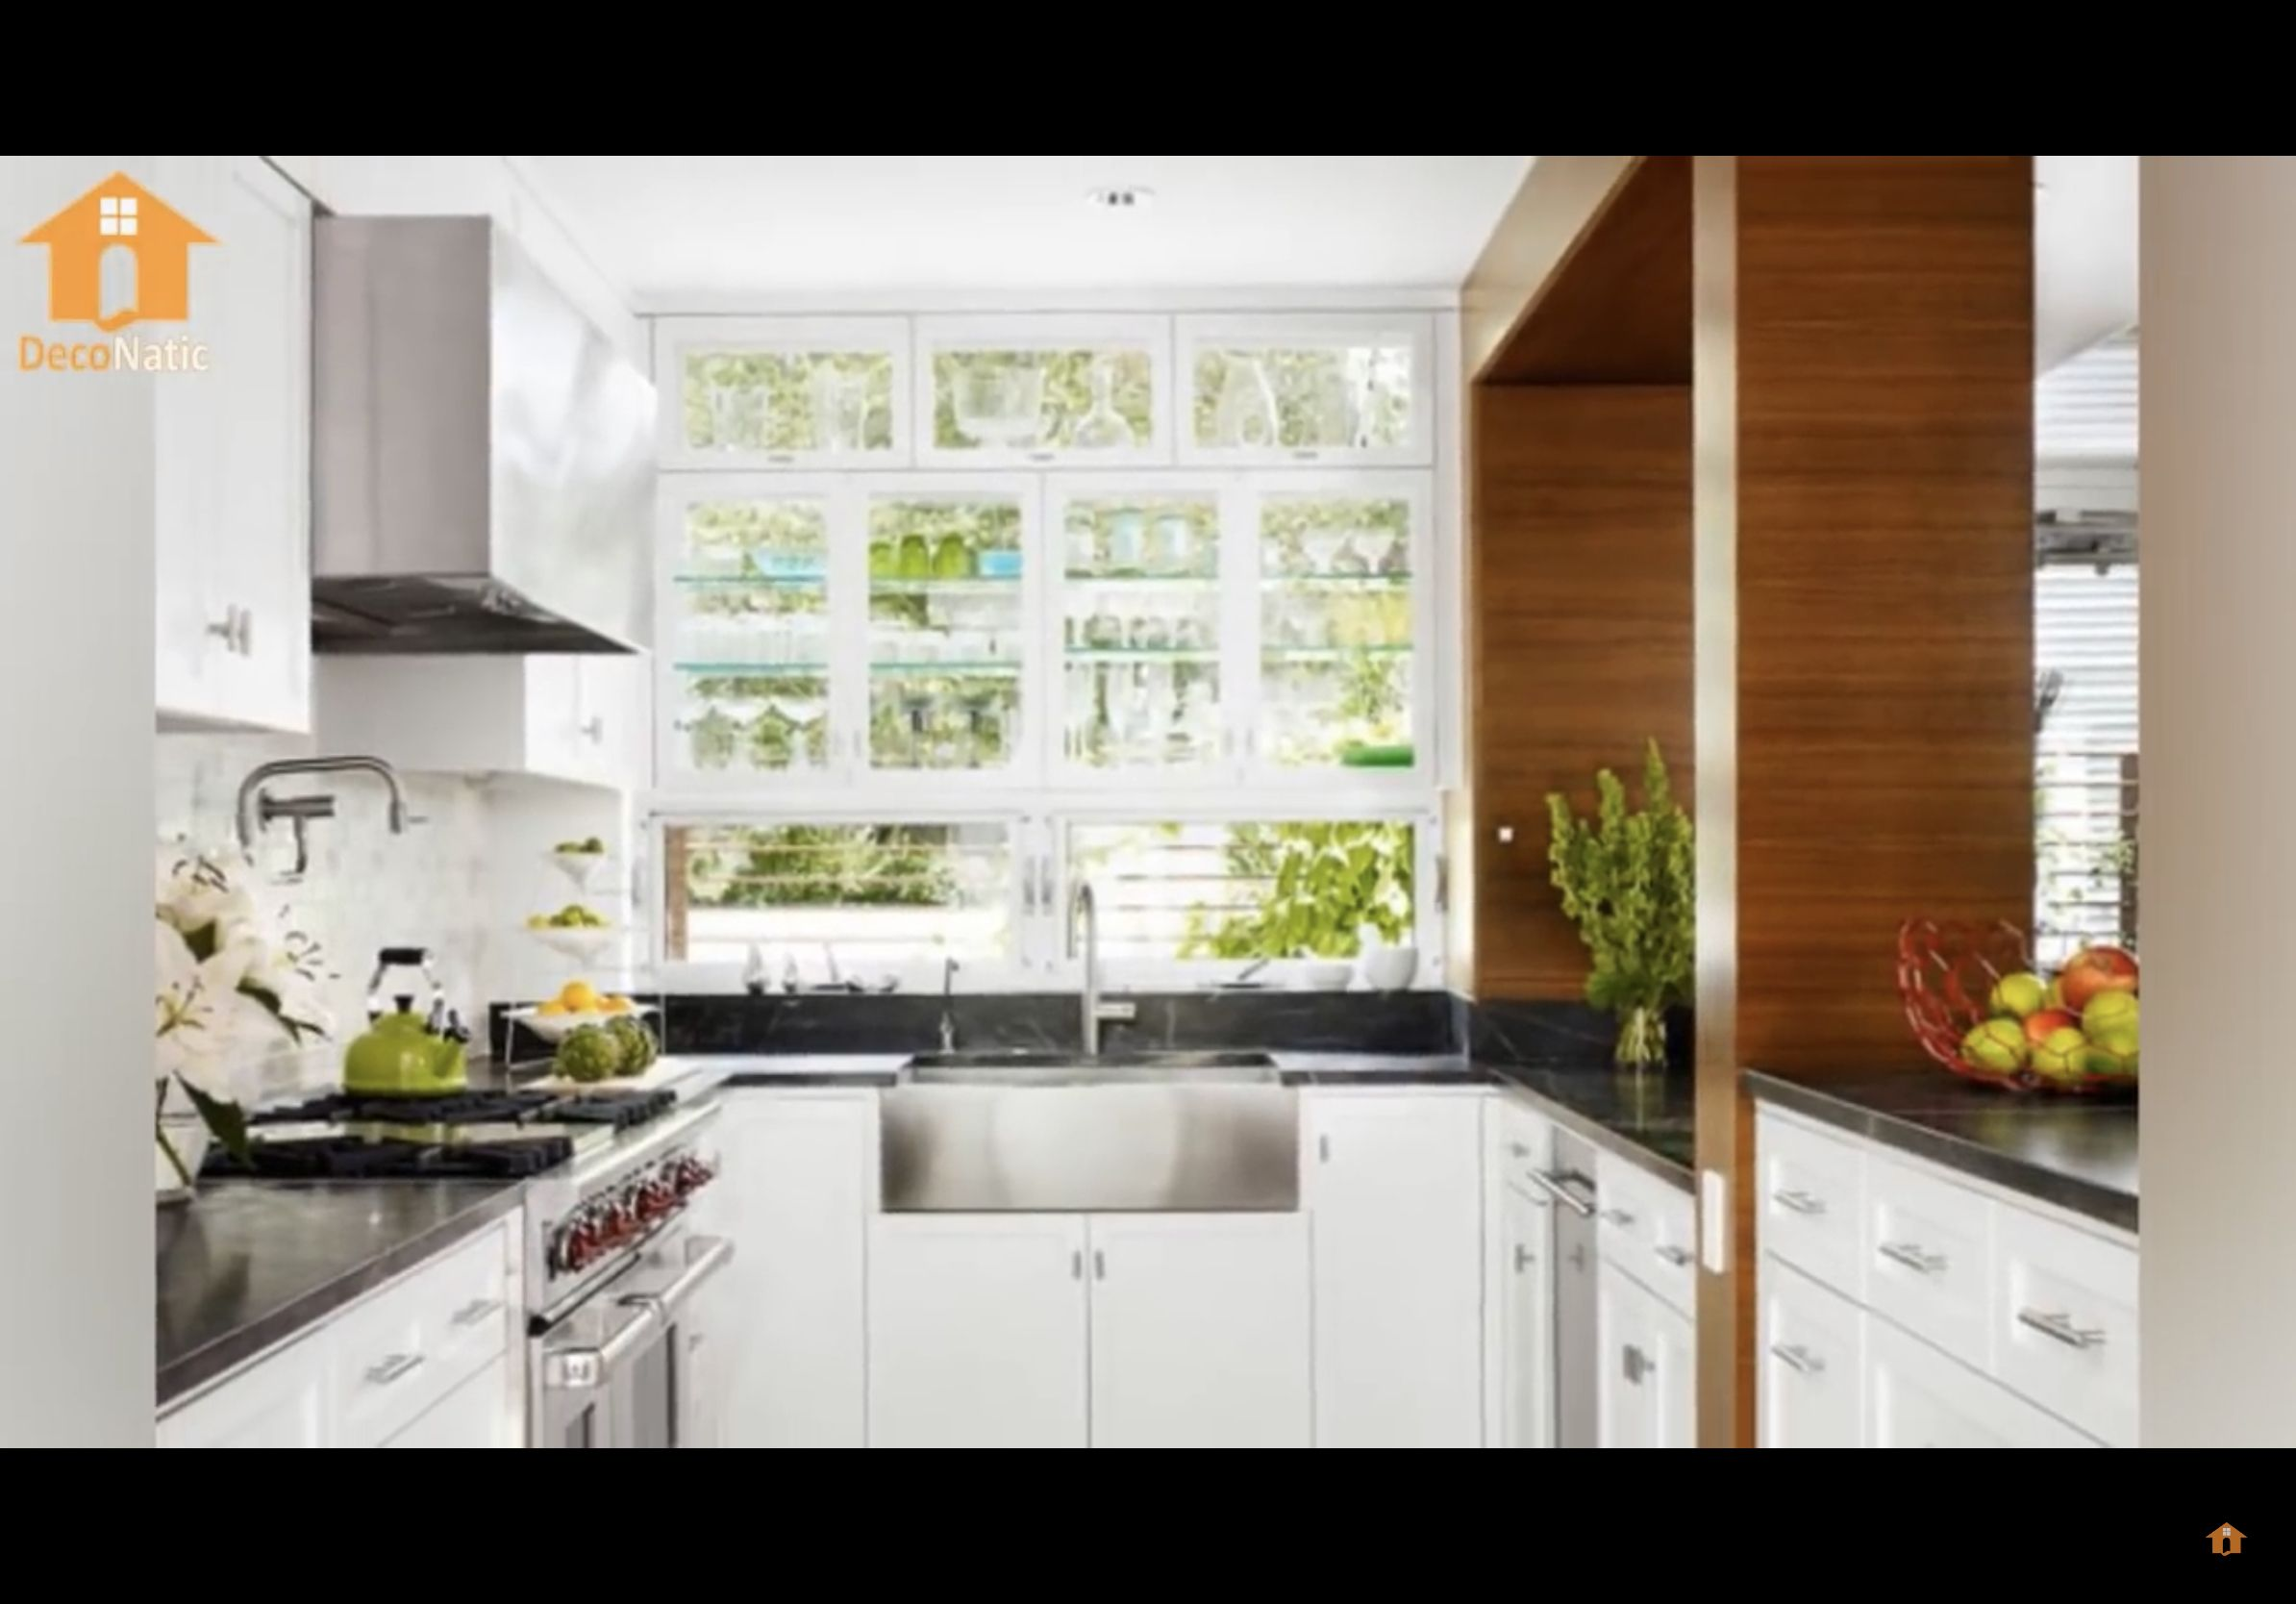 Pin By Libusa On Kitchen In 2020 Kitchen Kitchen Cabinets Decor